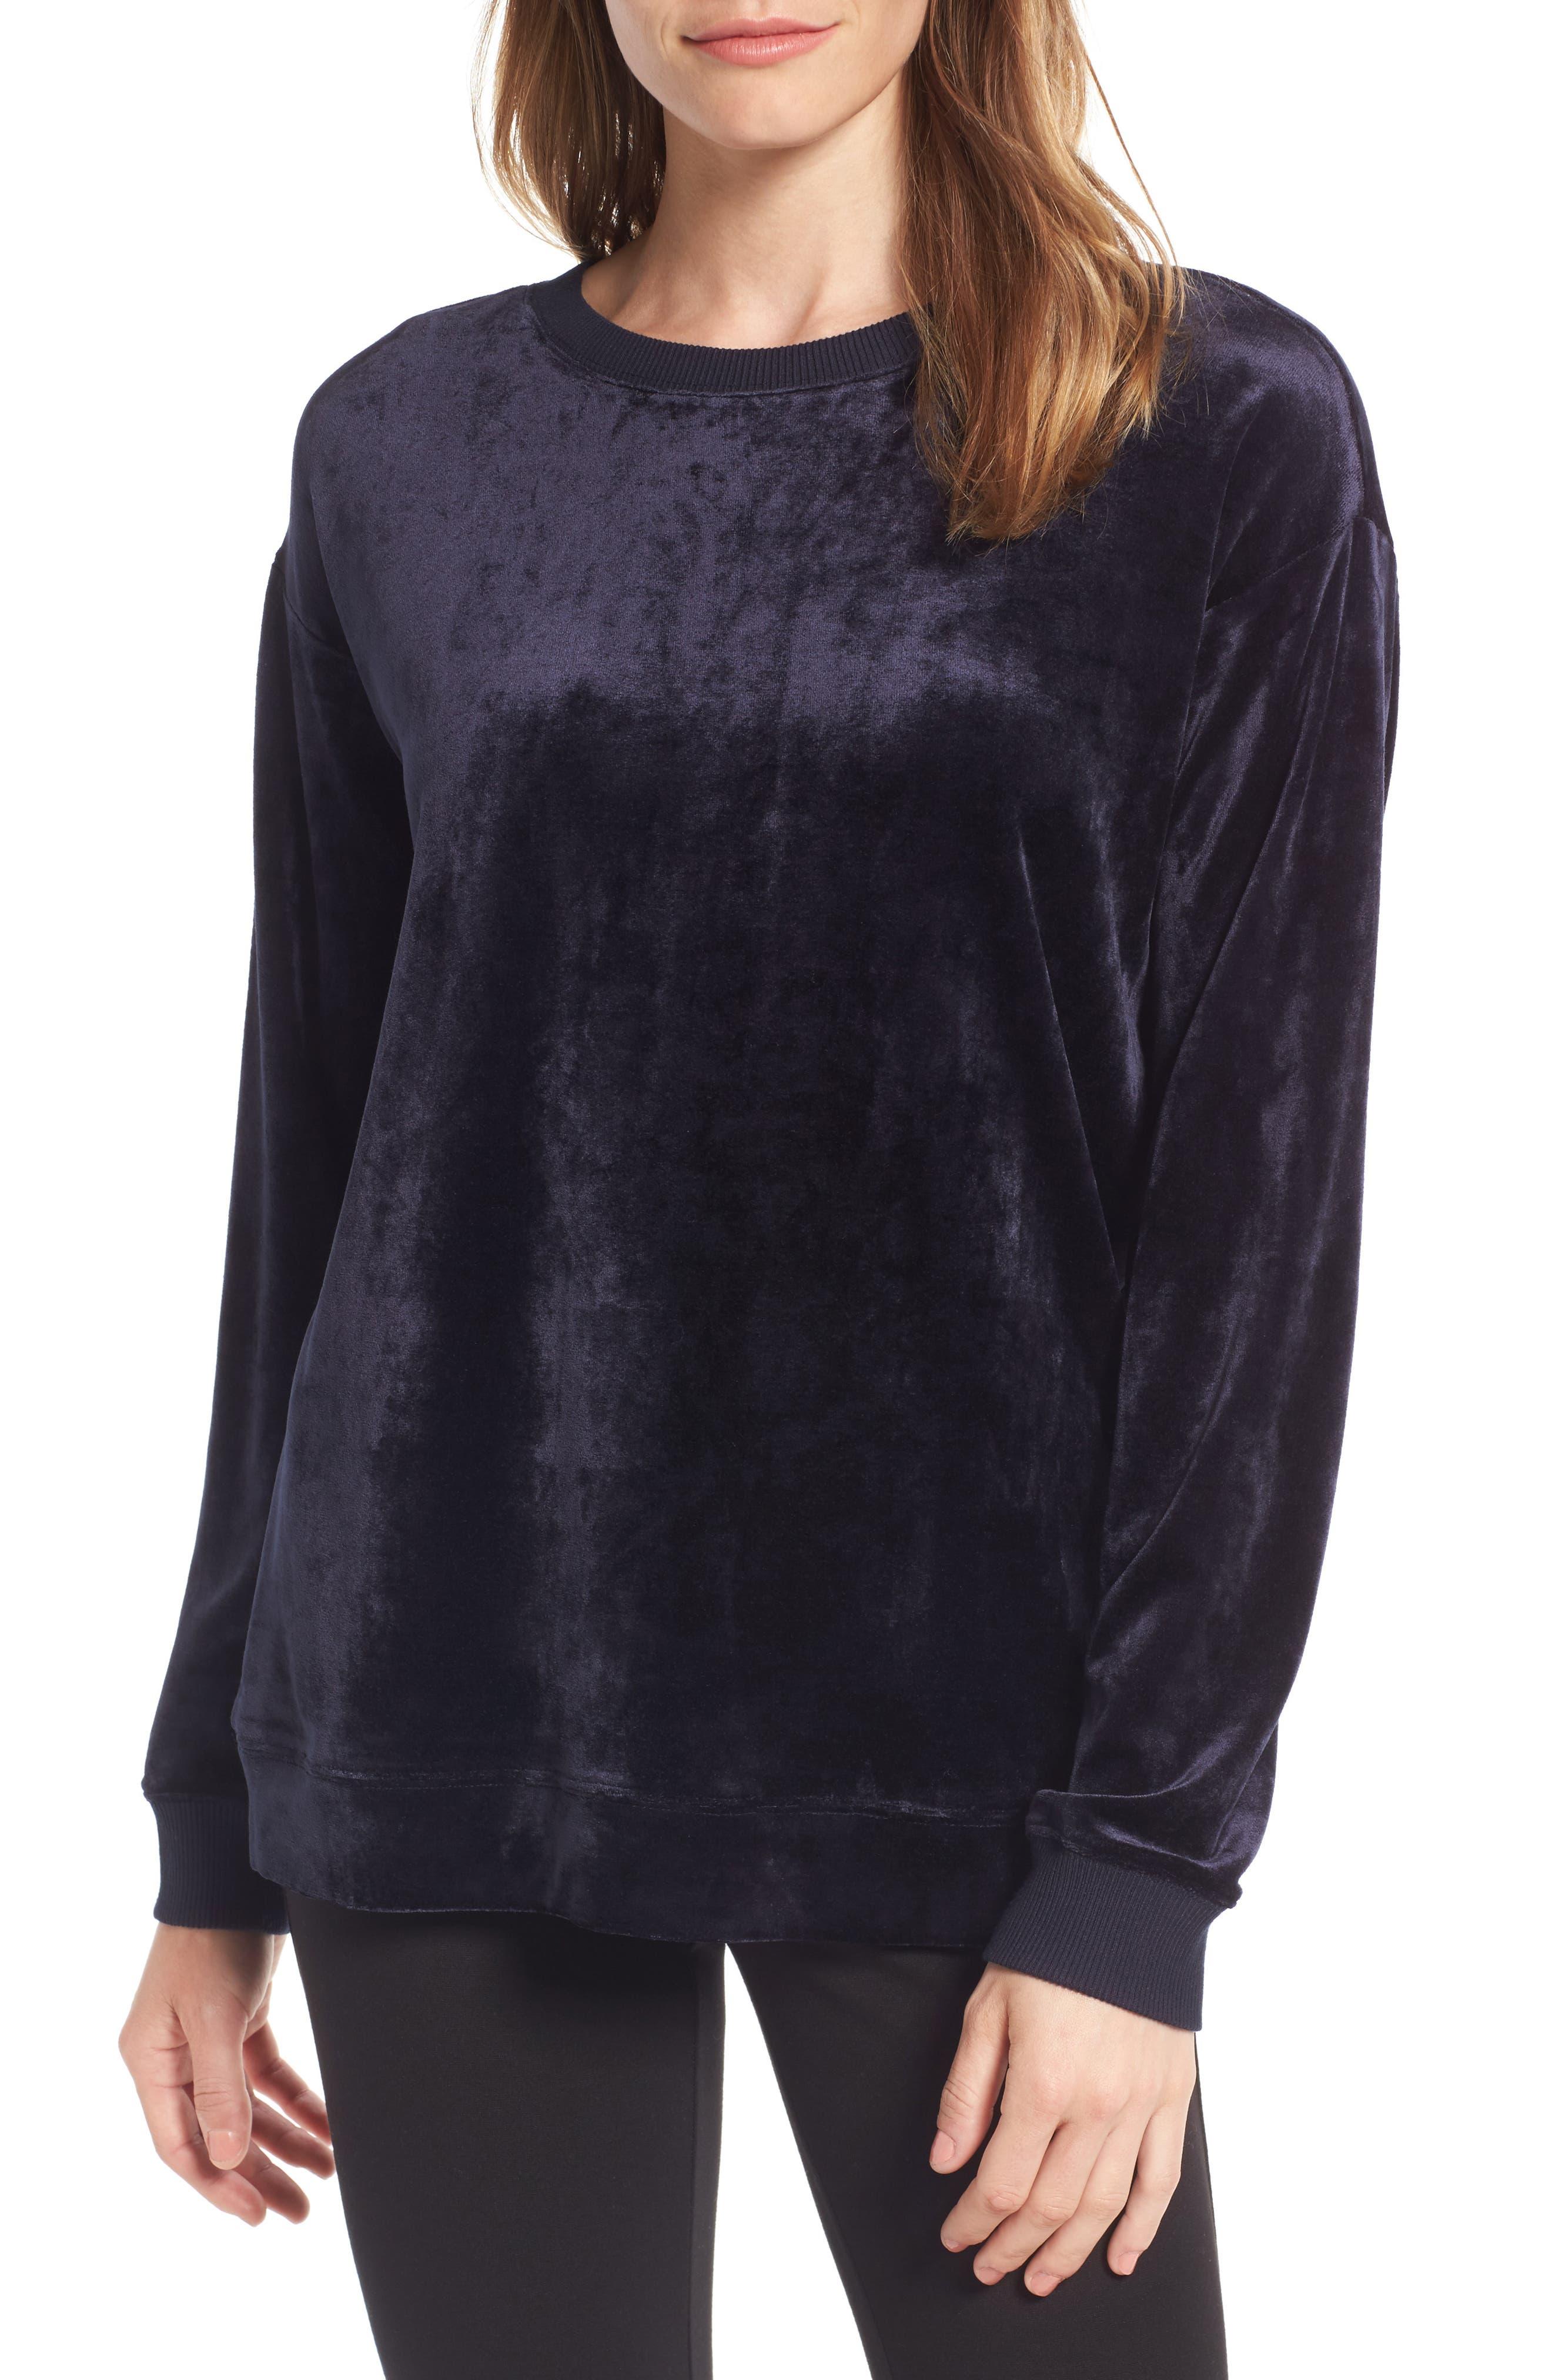 Nordstrom Signature Velvet Sweatshirt